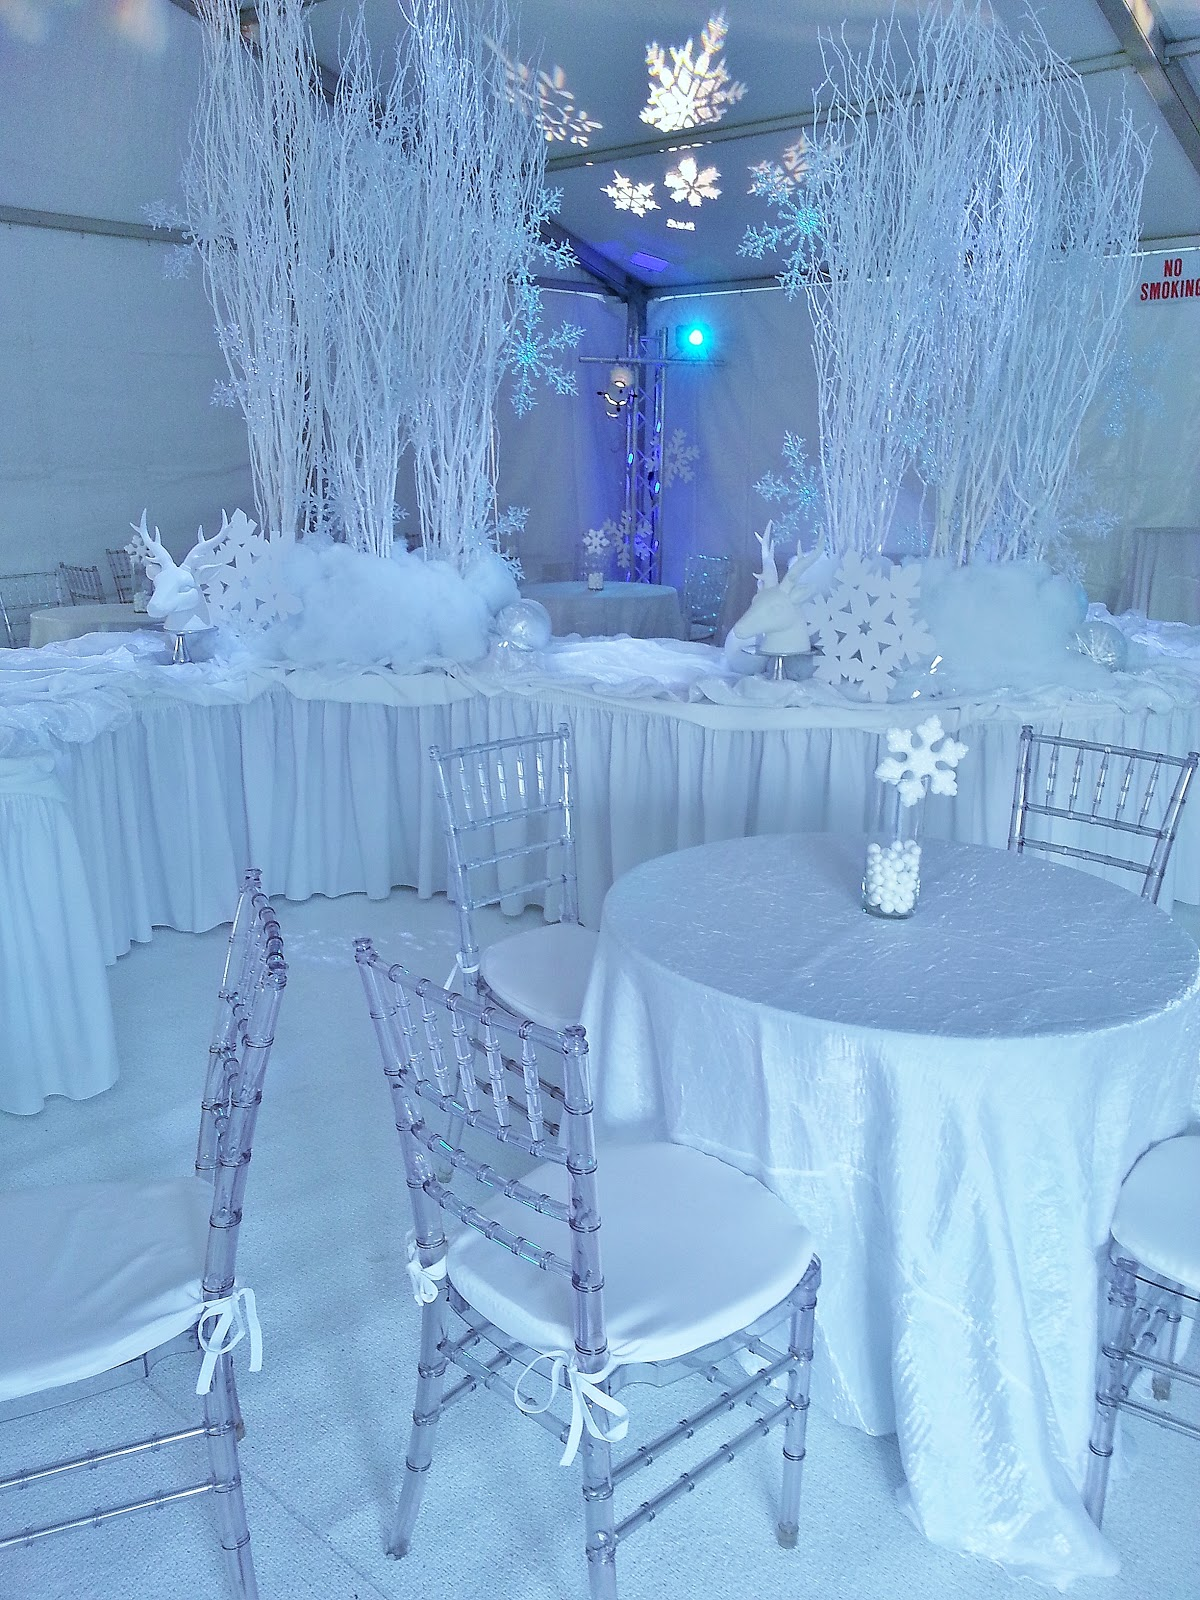 Winter Home Decor Ideas-interior-design-fresh-winter-themed-party-decorations-amazing